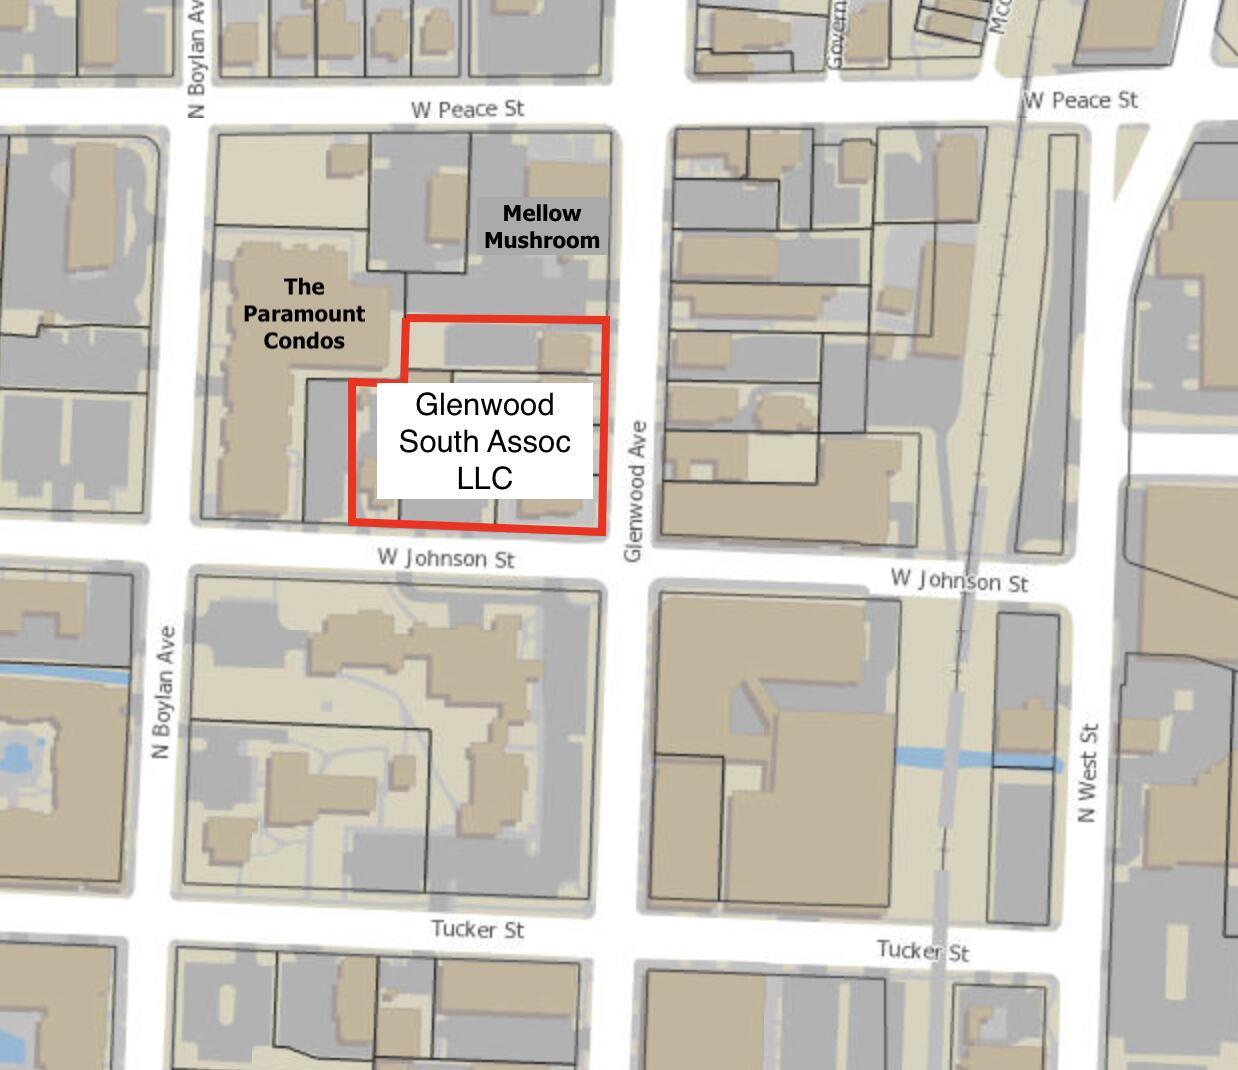 Glenwood South Associates LLC